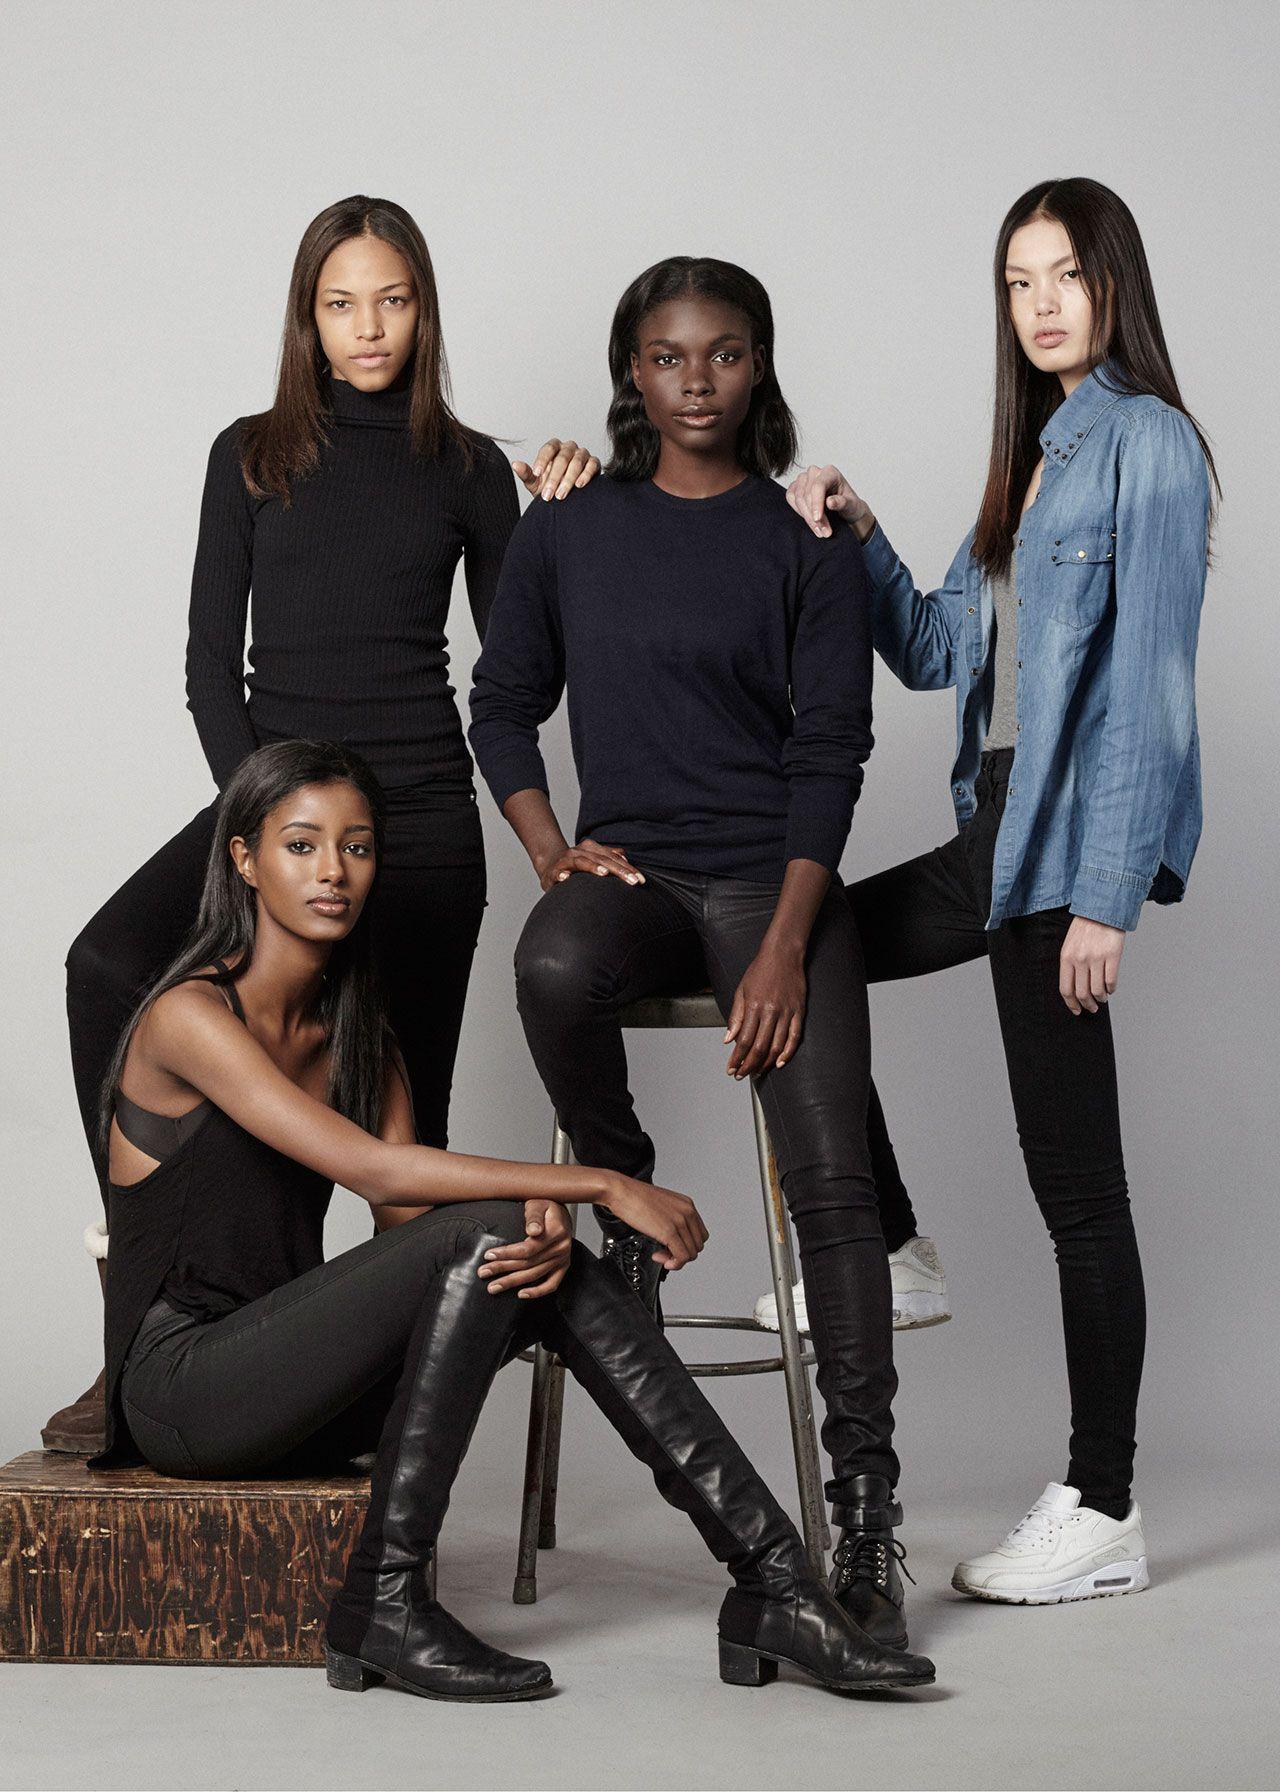 e9d008afc Diversity Rules! Part 3: IMG | models.com MDX | Makeup Inspiration ...